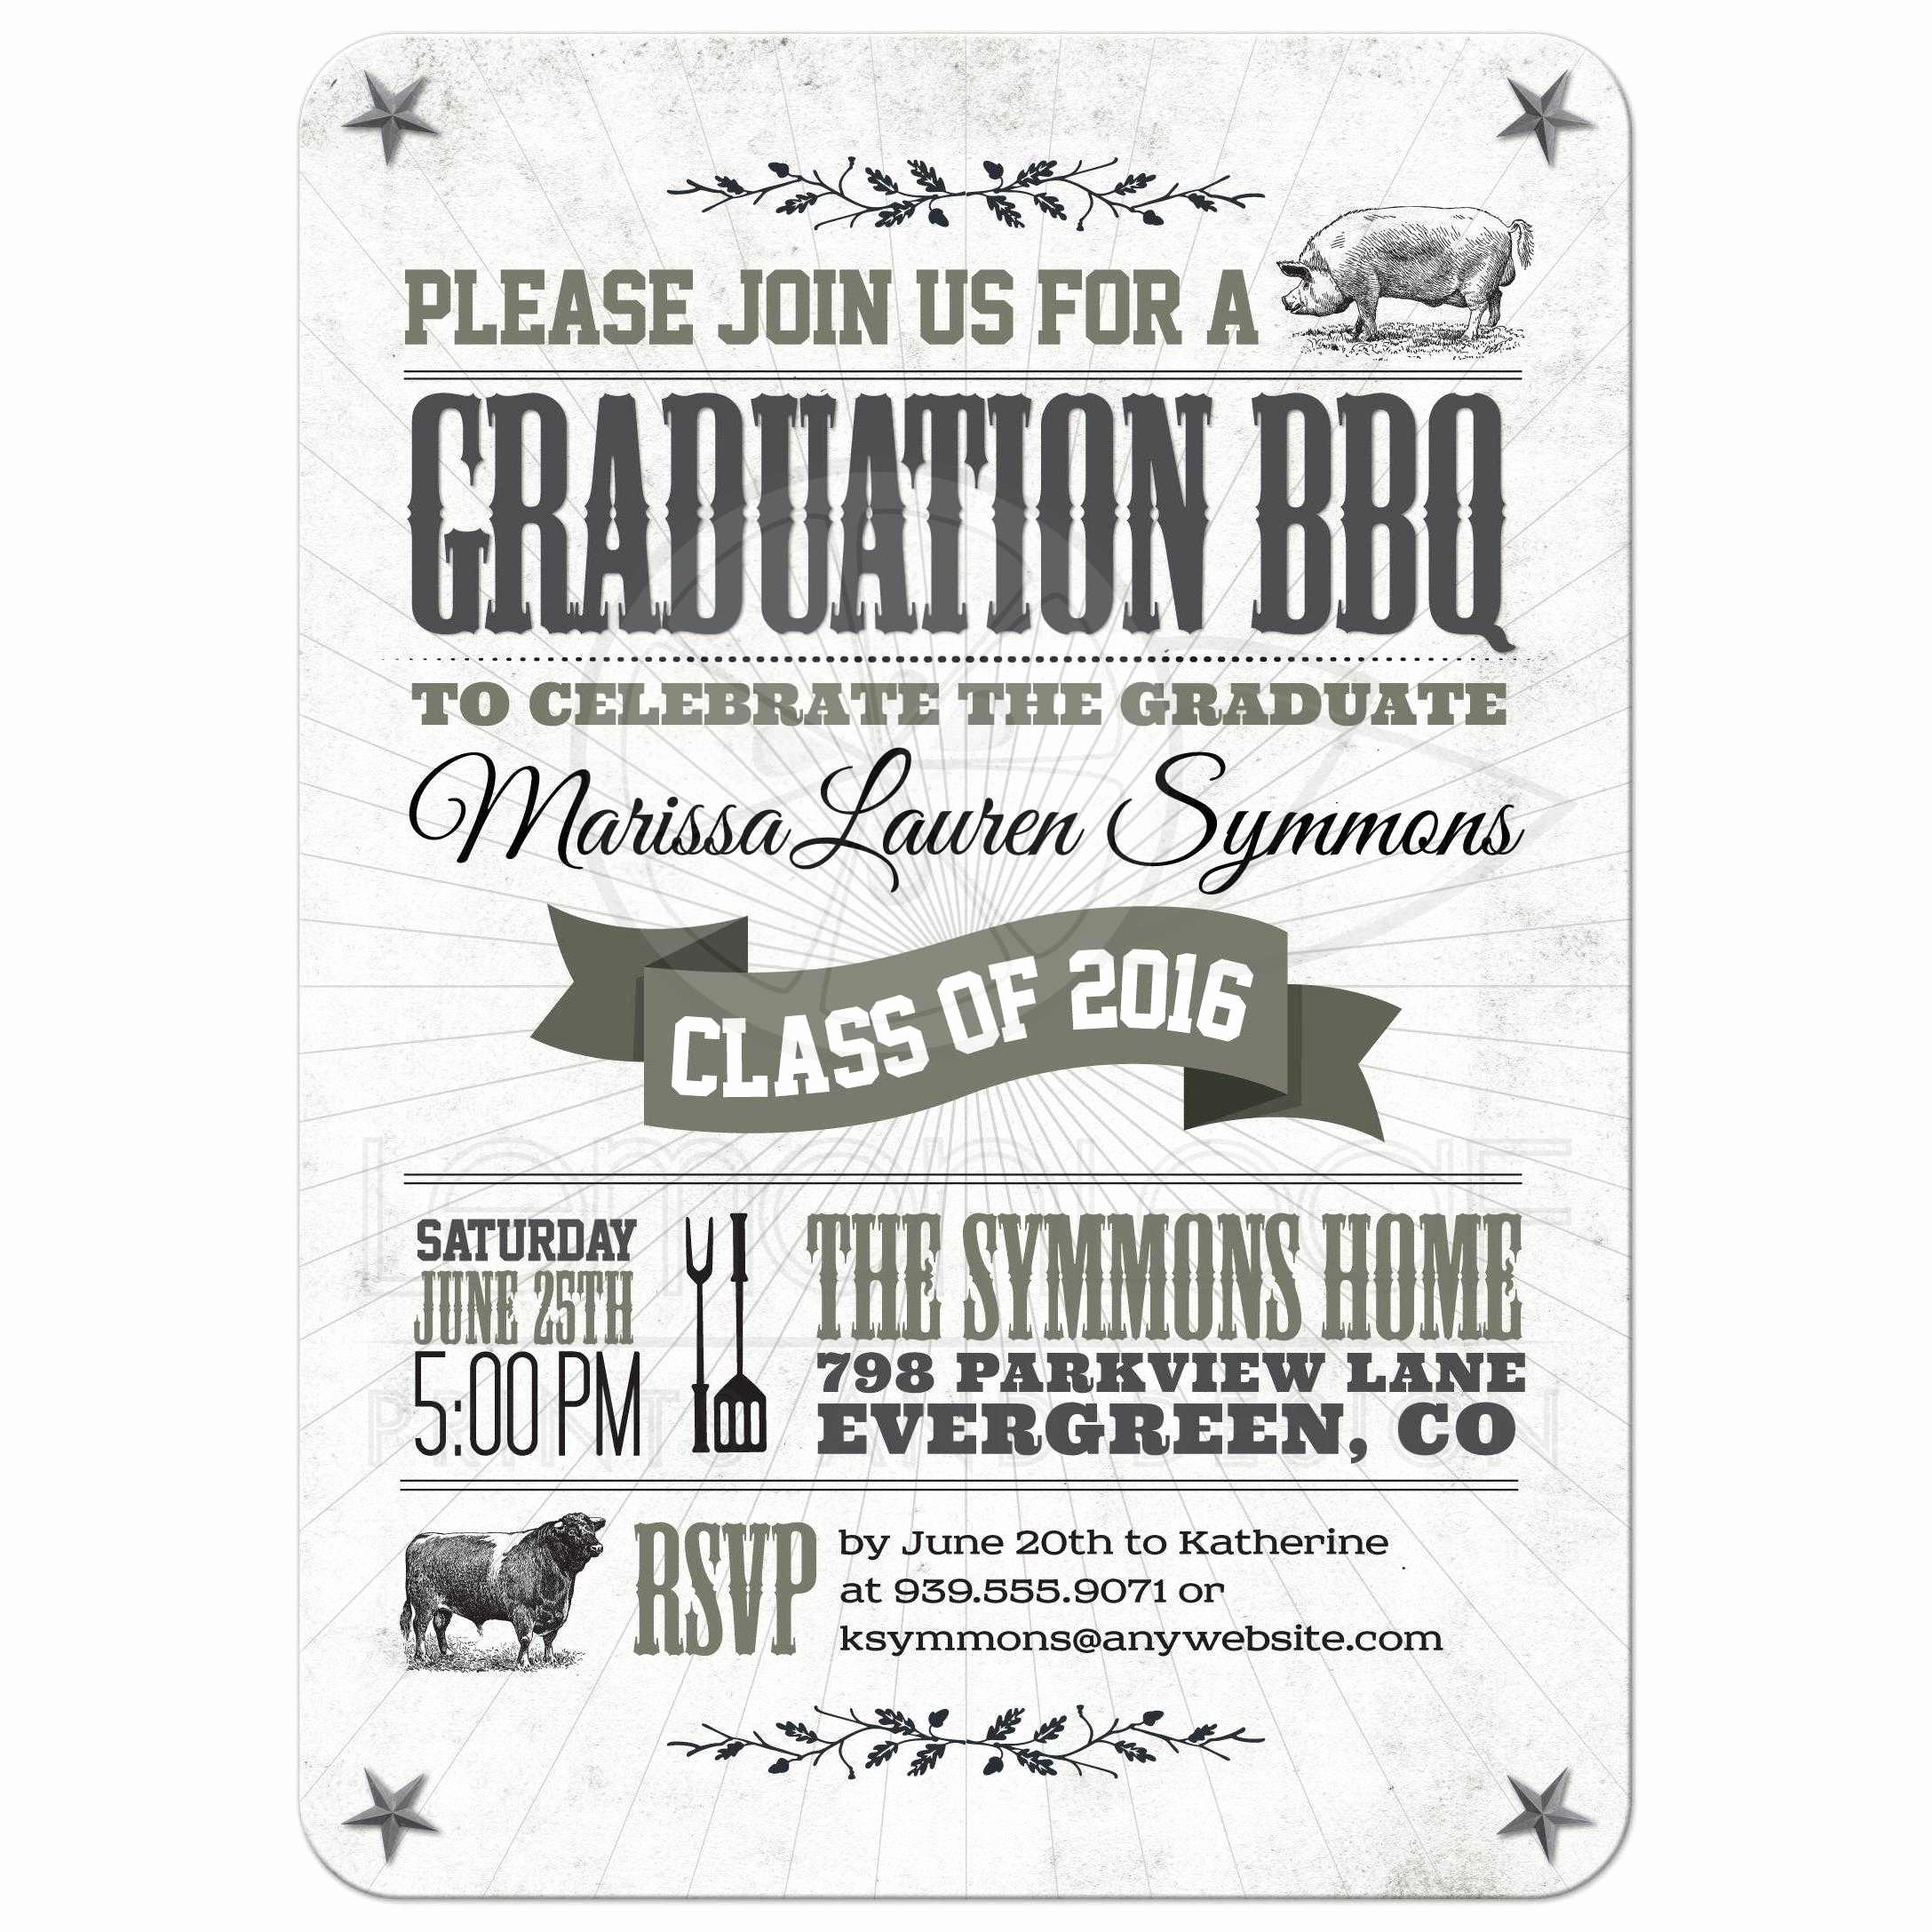 Graduation Bbq Invitation Wording Inspirational Graduation Party Invitation Rustic Bbq Pig and Cow Gray